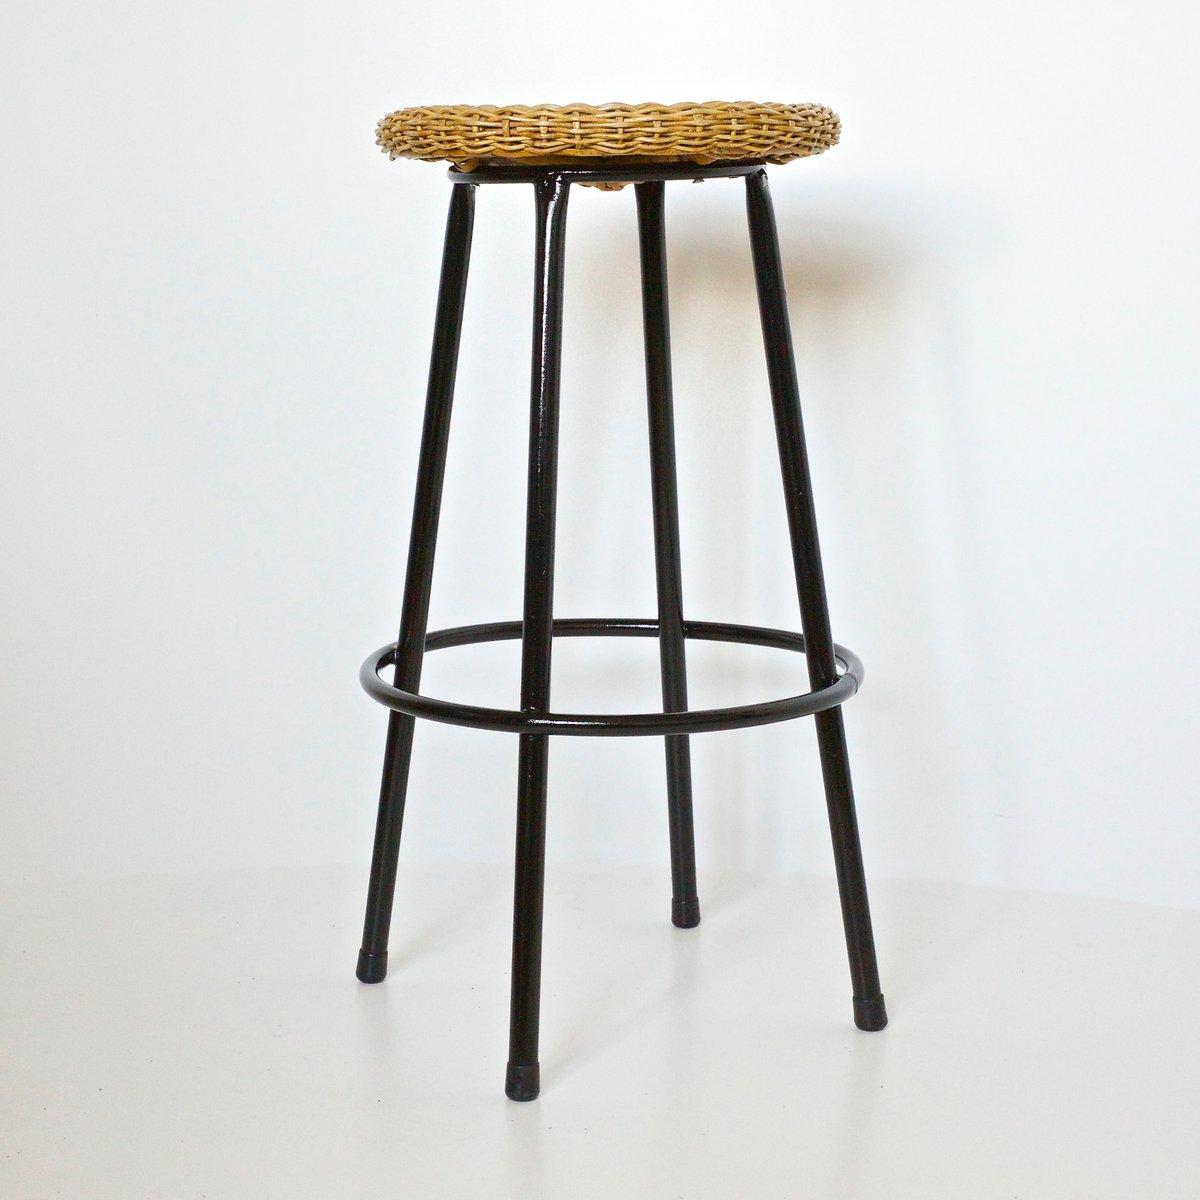 100 metal bar stools vintage kitchen west elm counter stool